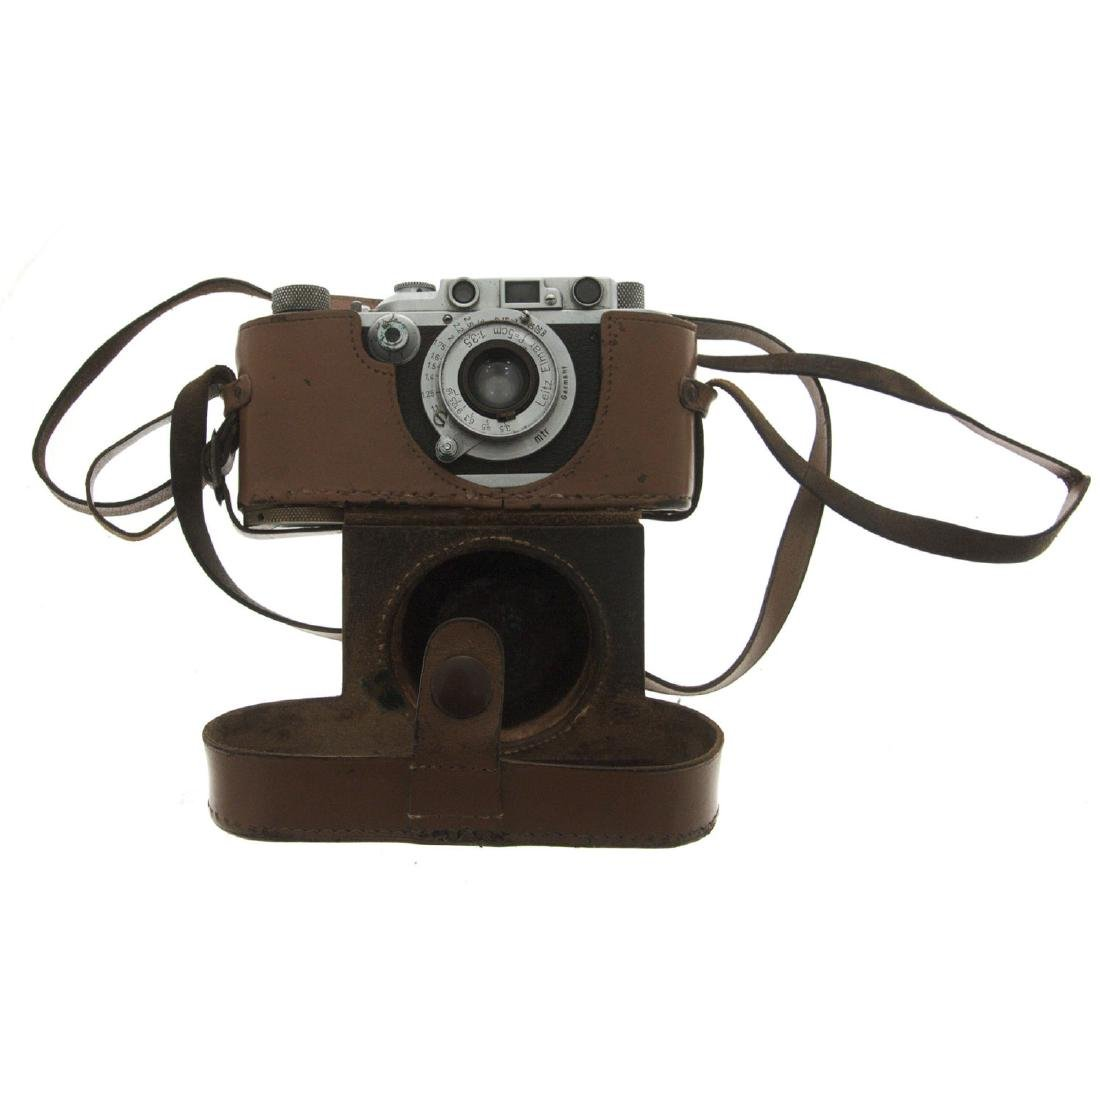 Leica II Ernst Leitz Wetzlar Camera with Elmar Lens. - 3